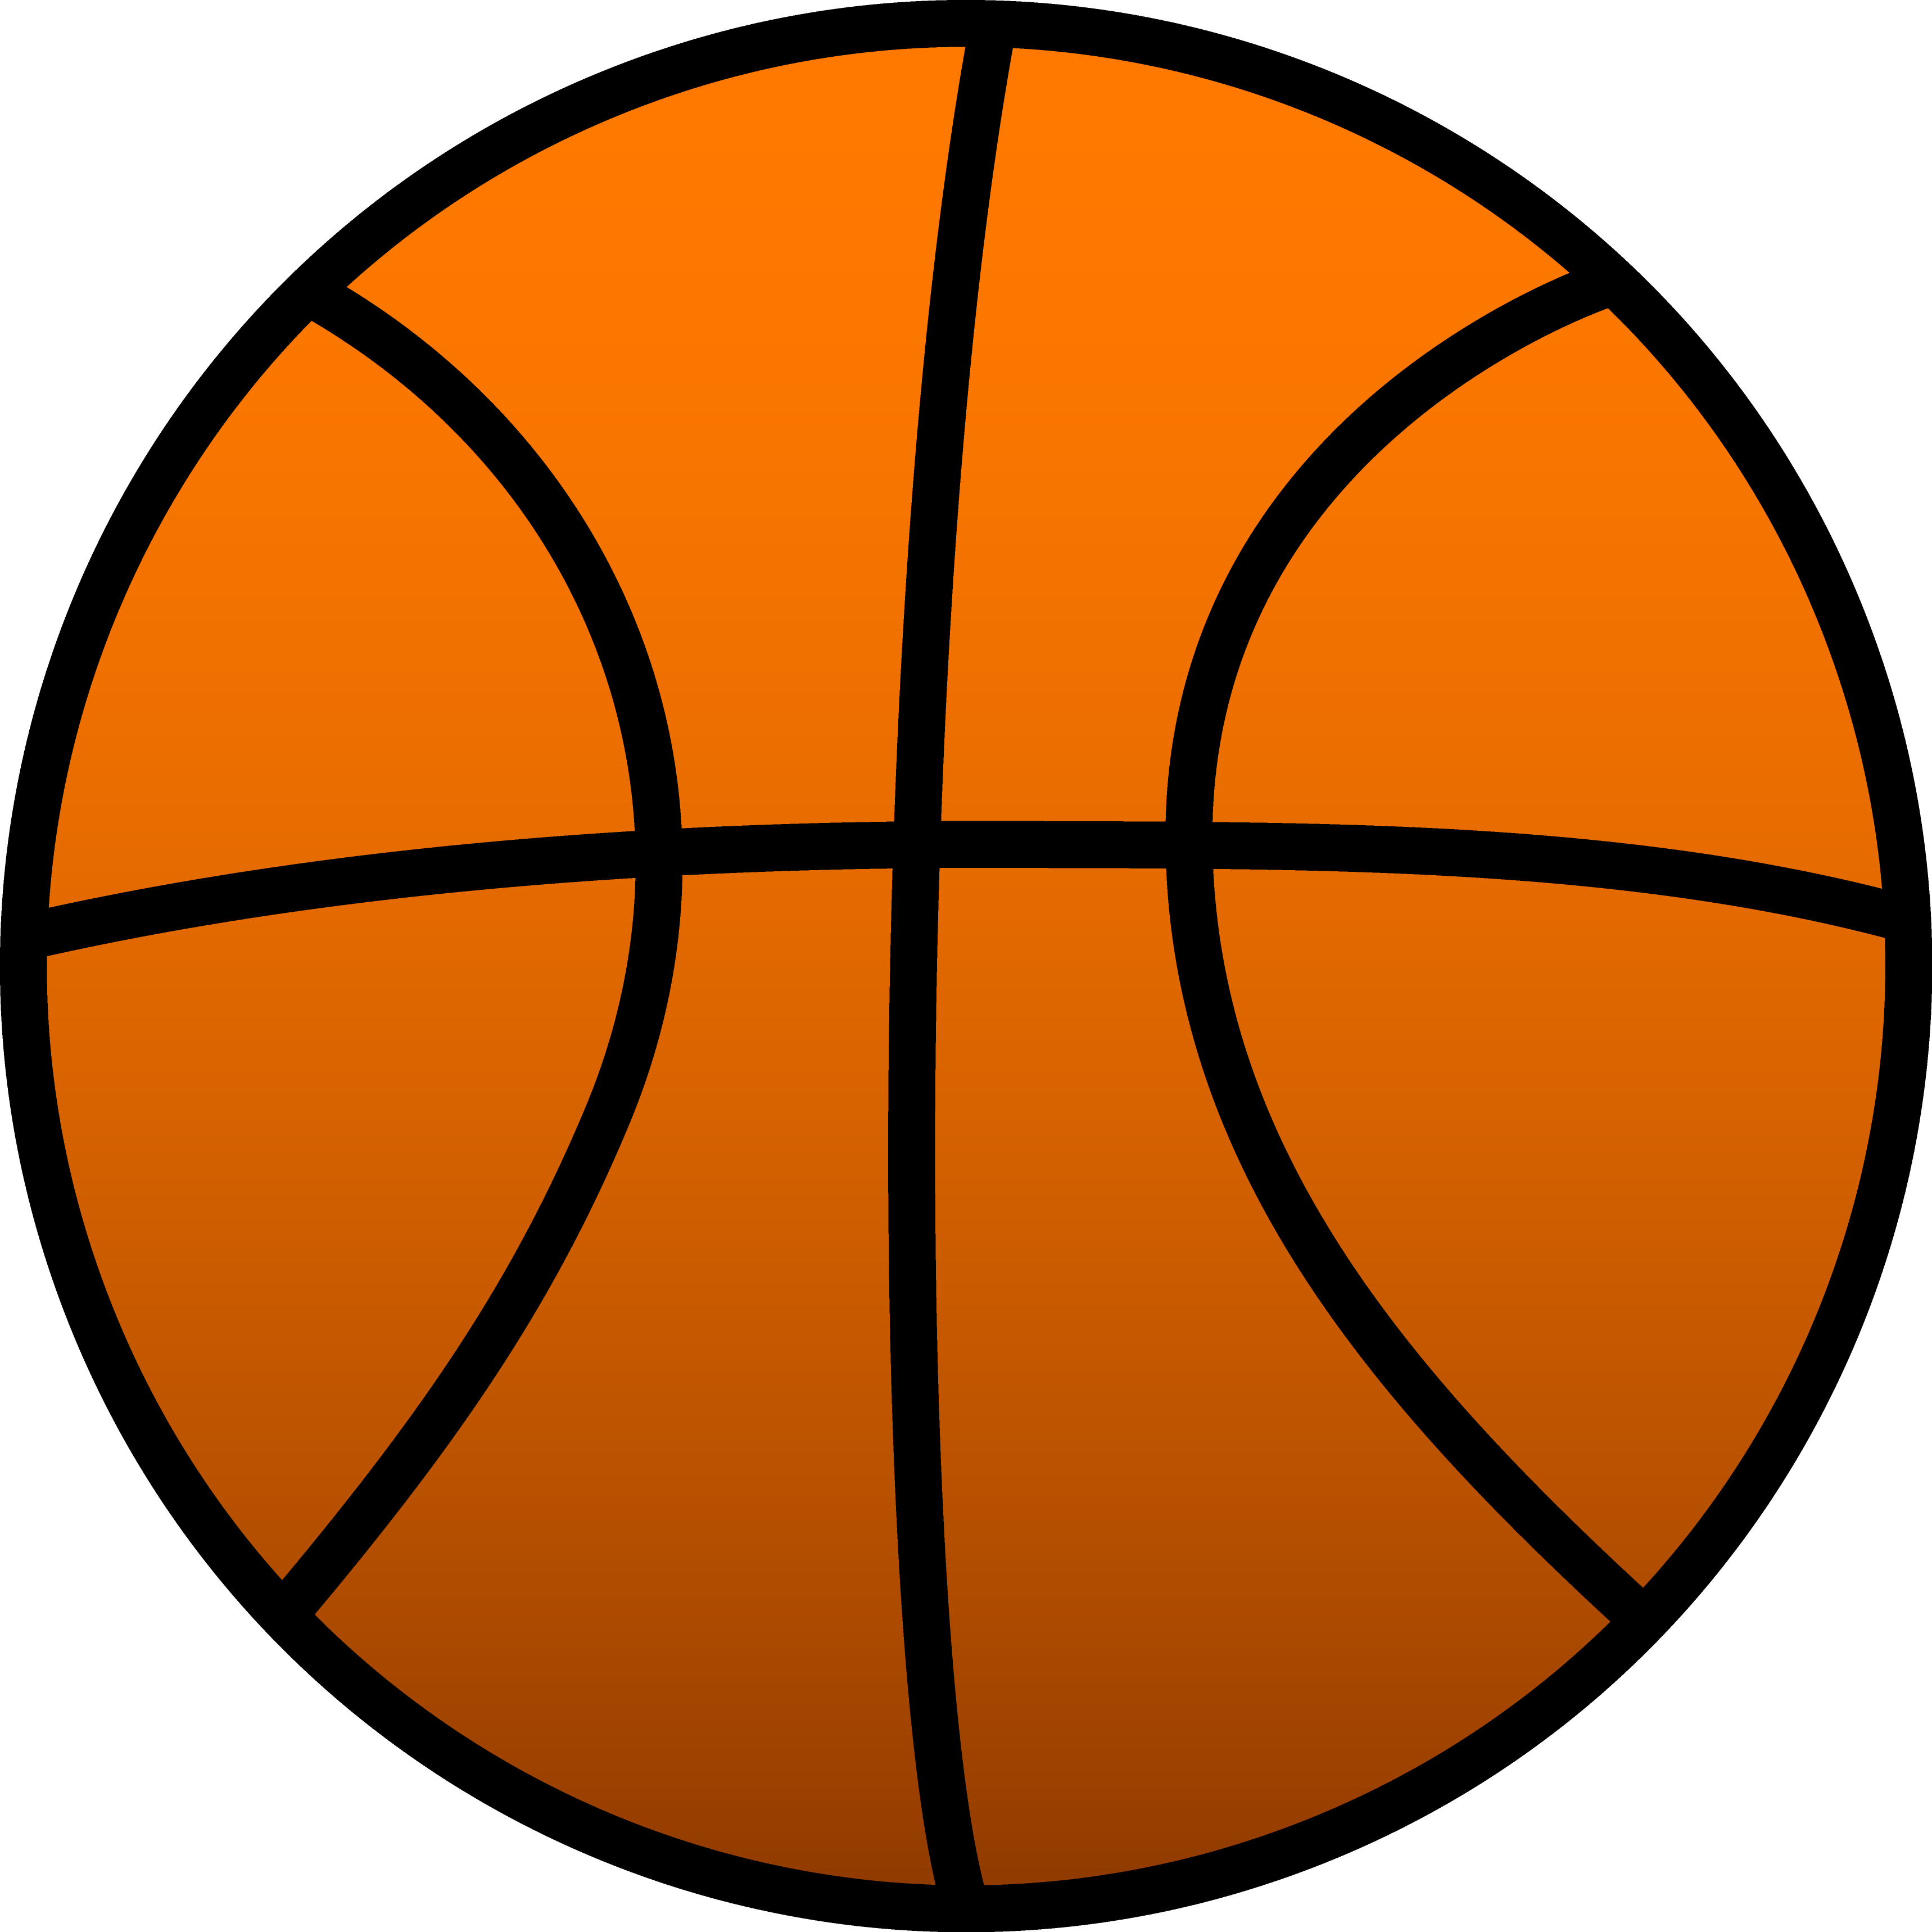 basketball scoreboard clipart-basketball scoreboard clipart-1